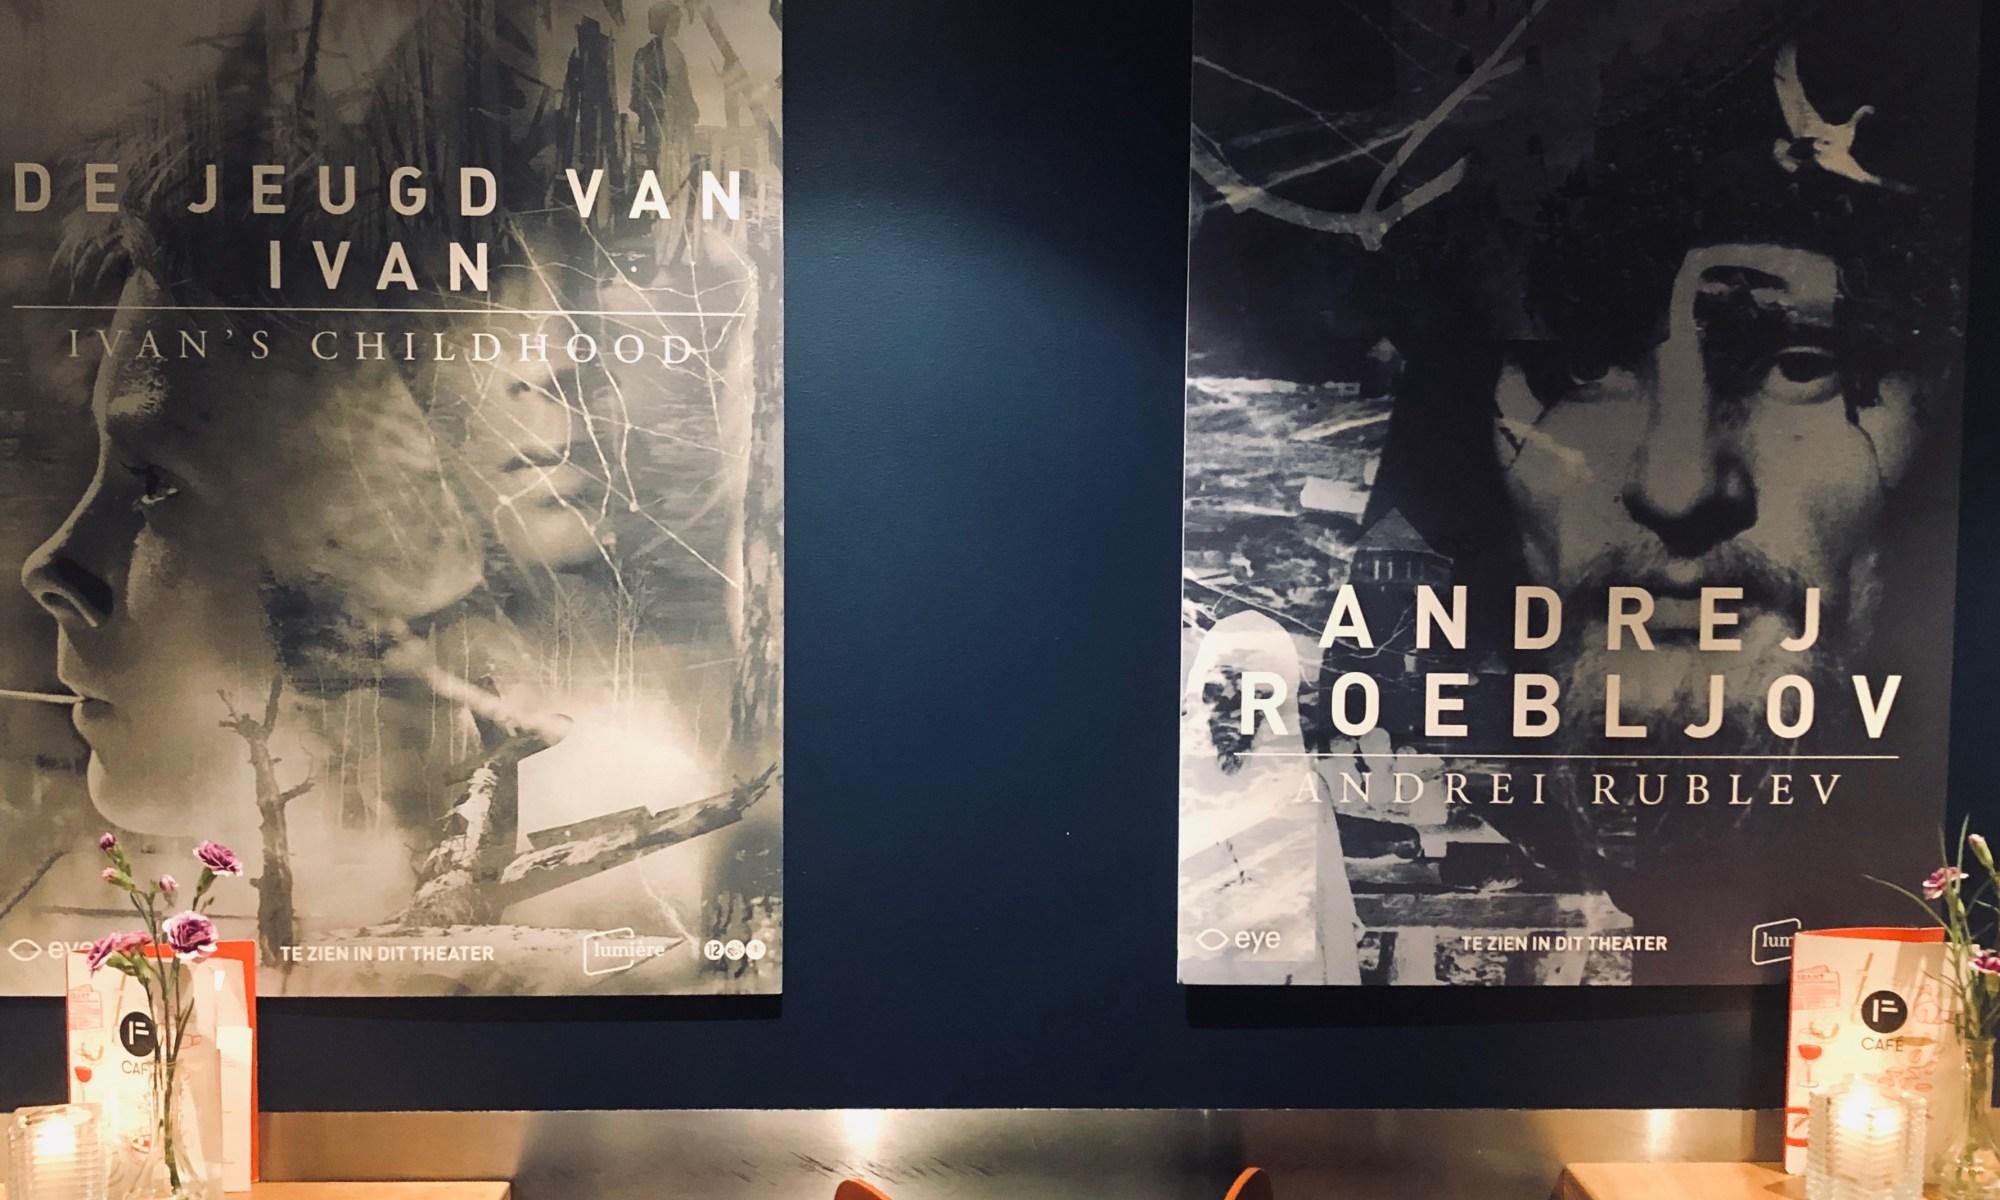 Tarkovski film posters